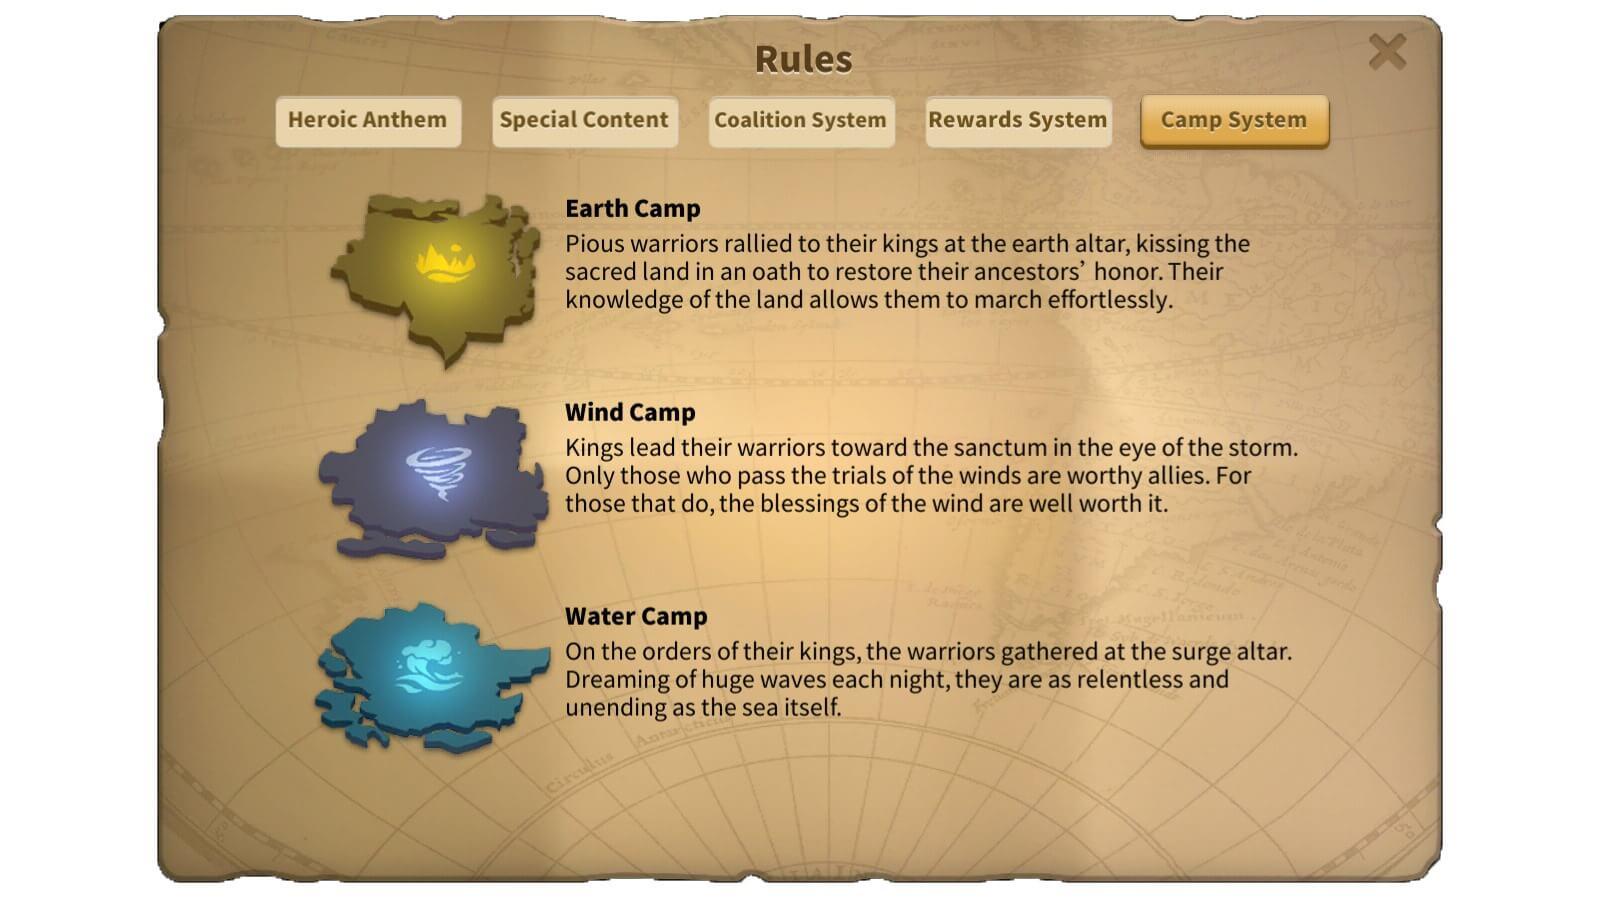 camp-system-2